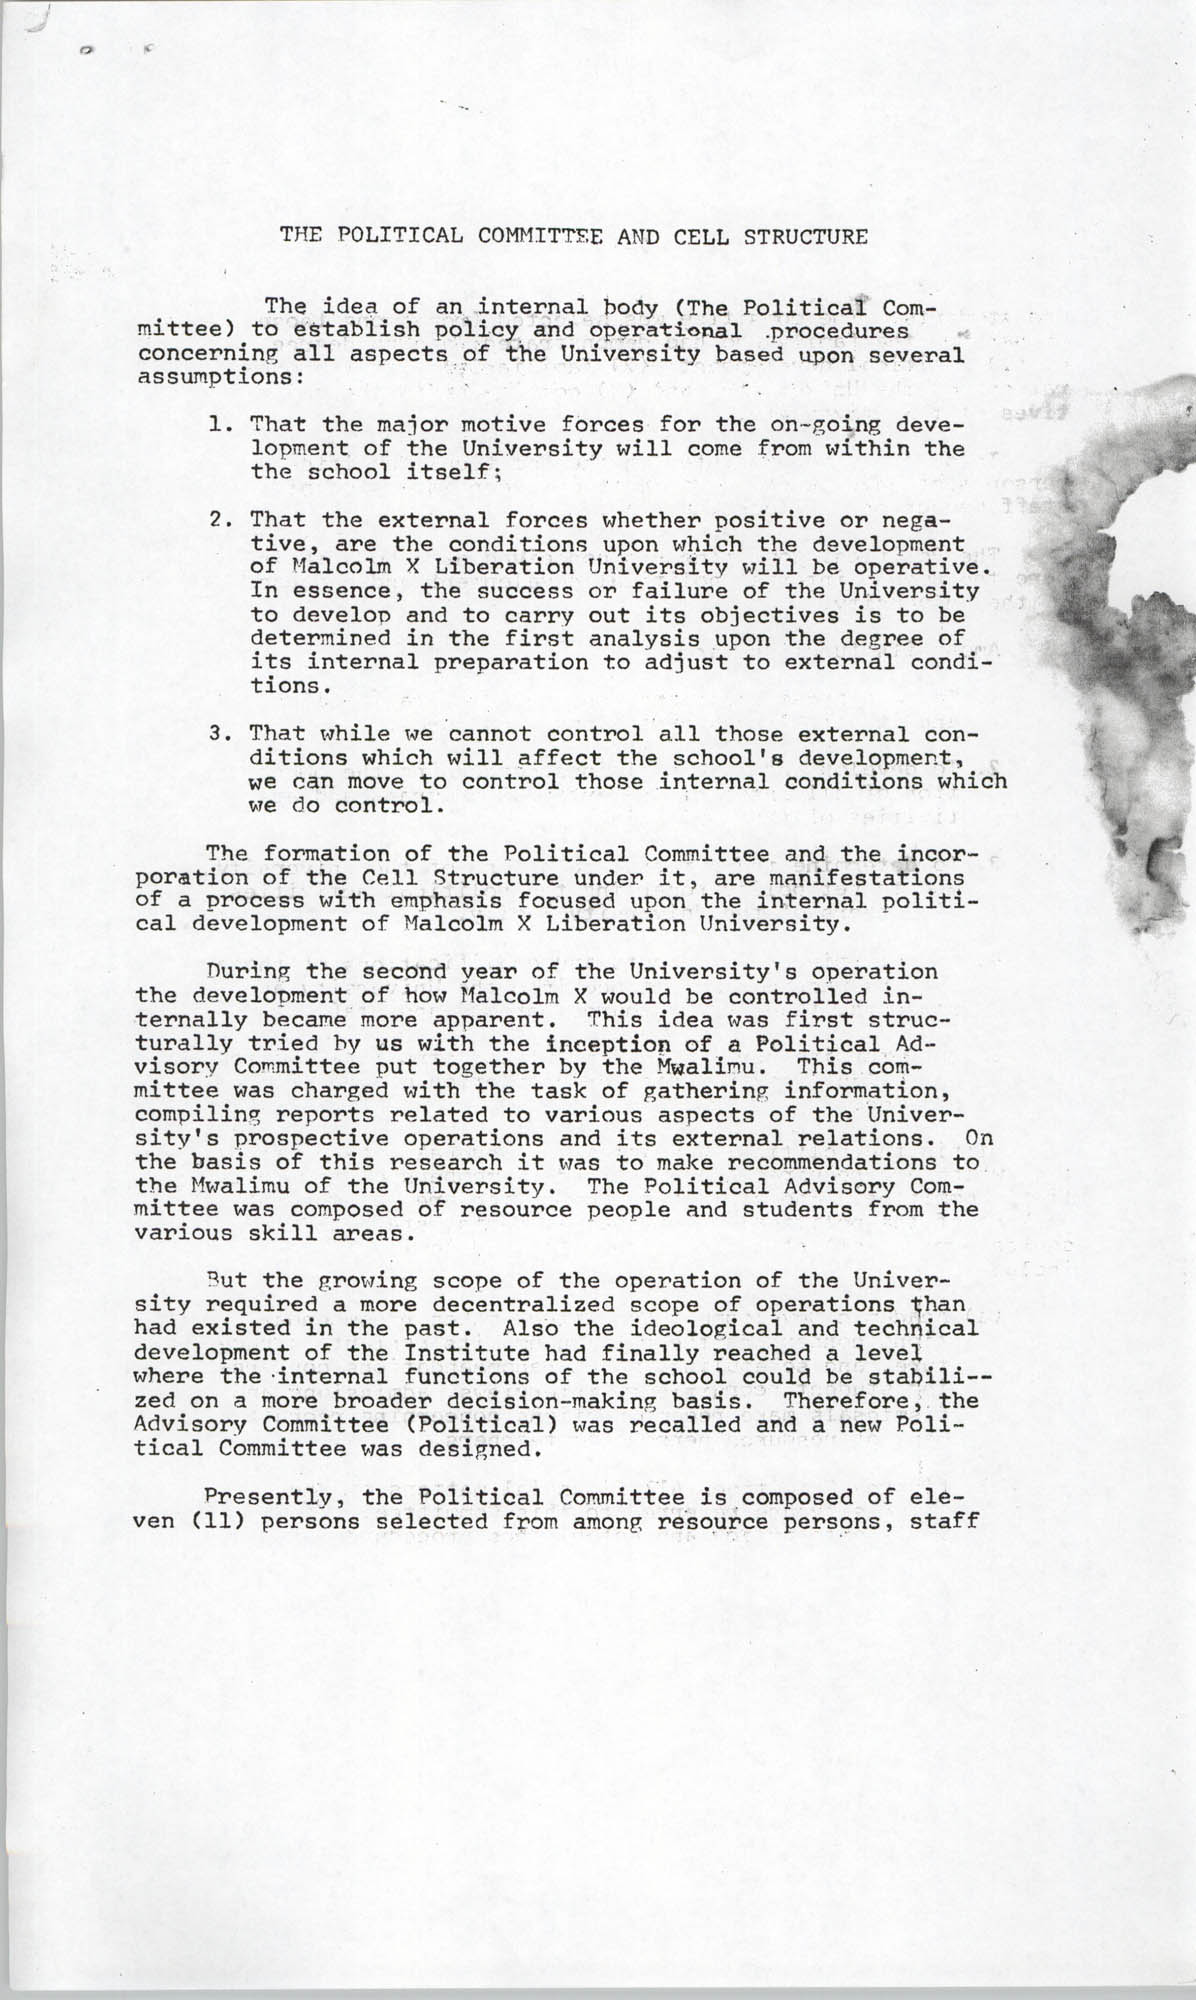 Malcolm X Liberation University Organization and Administration, 1969